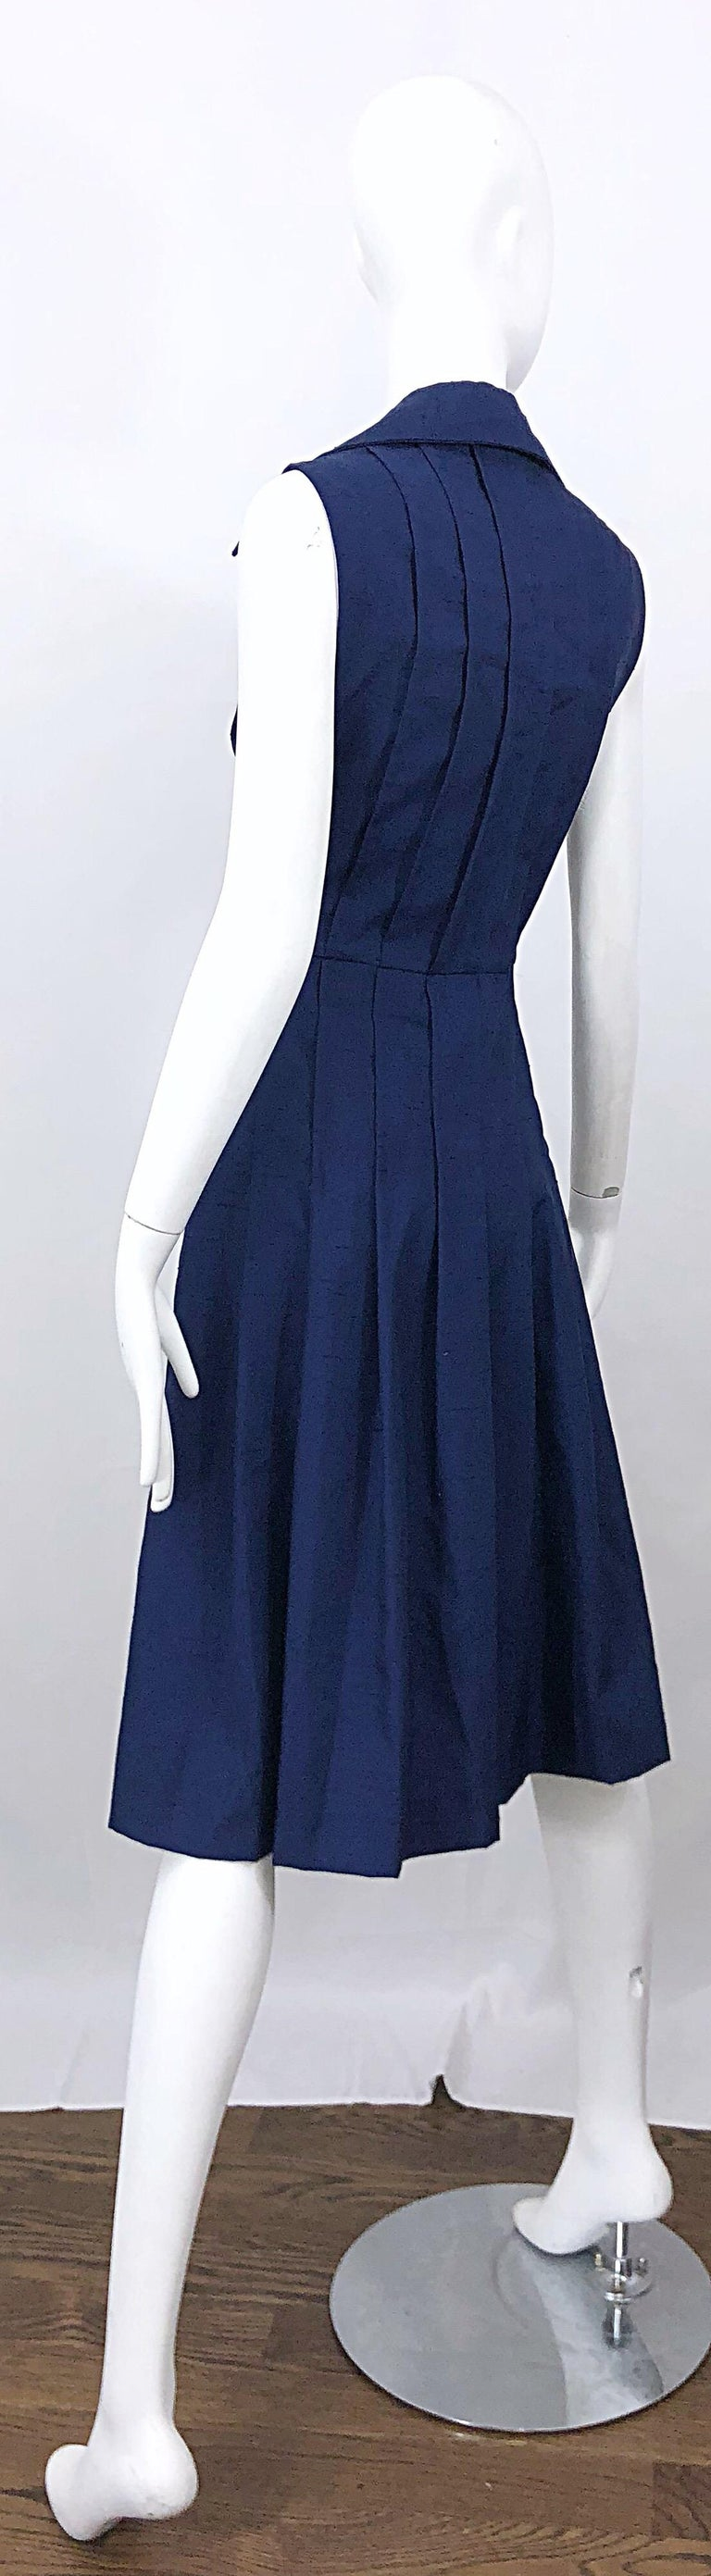 1990s Saks 5th Avenue Size 10 Navy Blue Silk Vintage 90s Sleeveless Shirt Dress For Sale 11